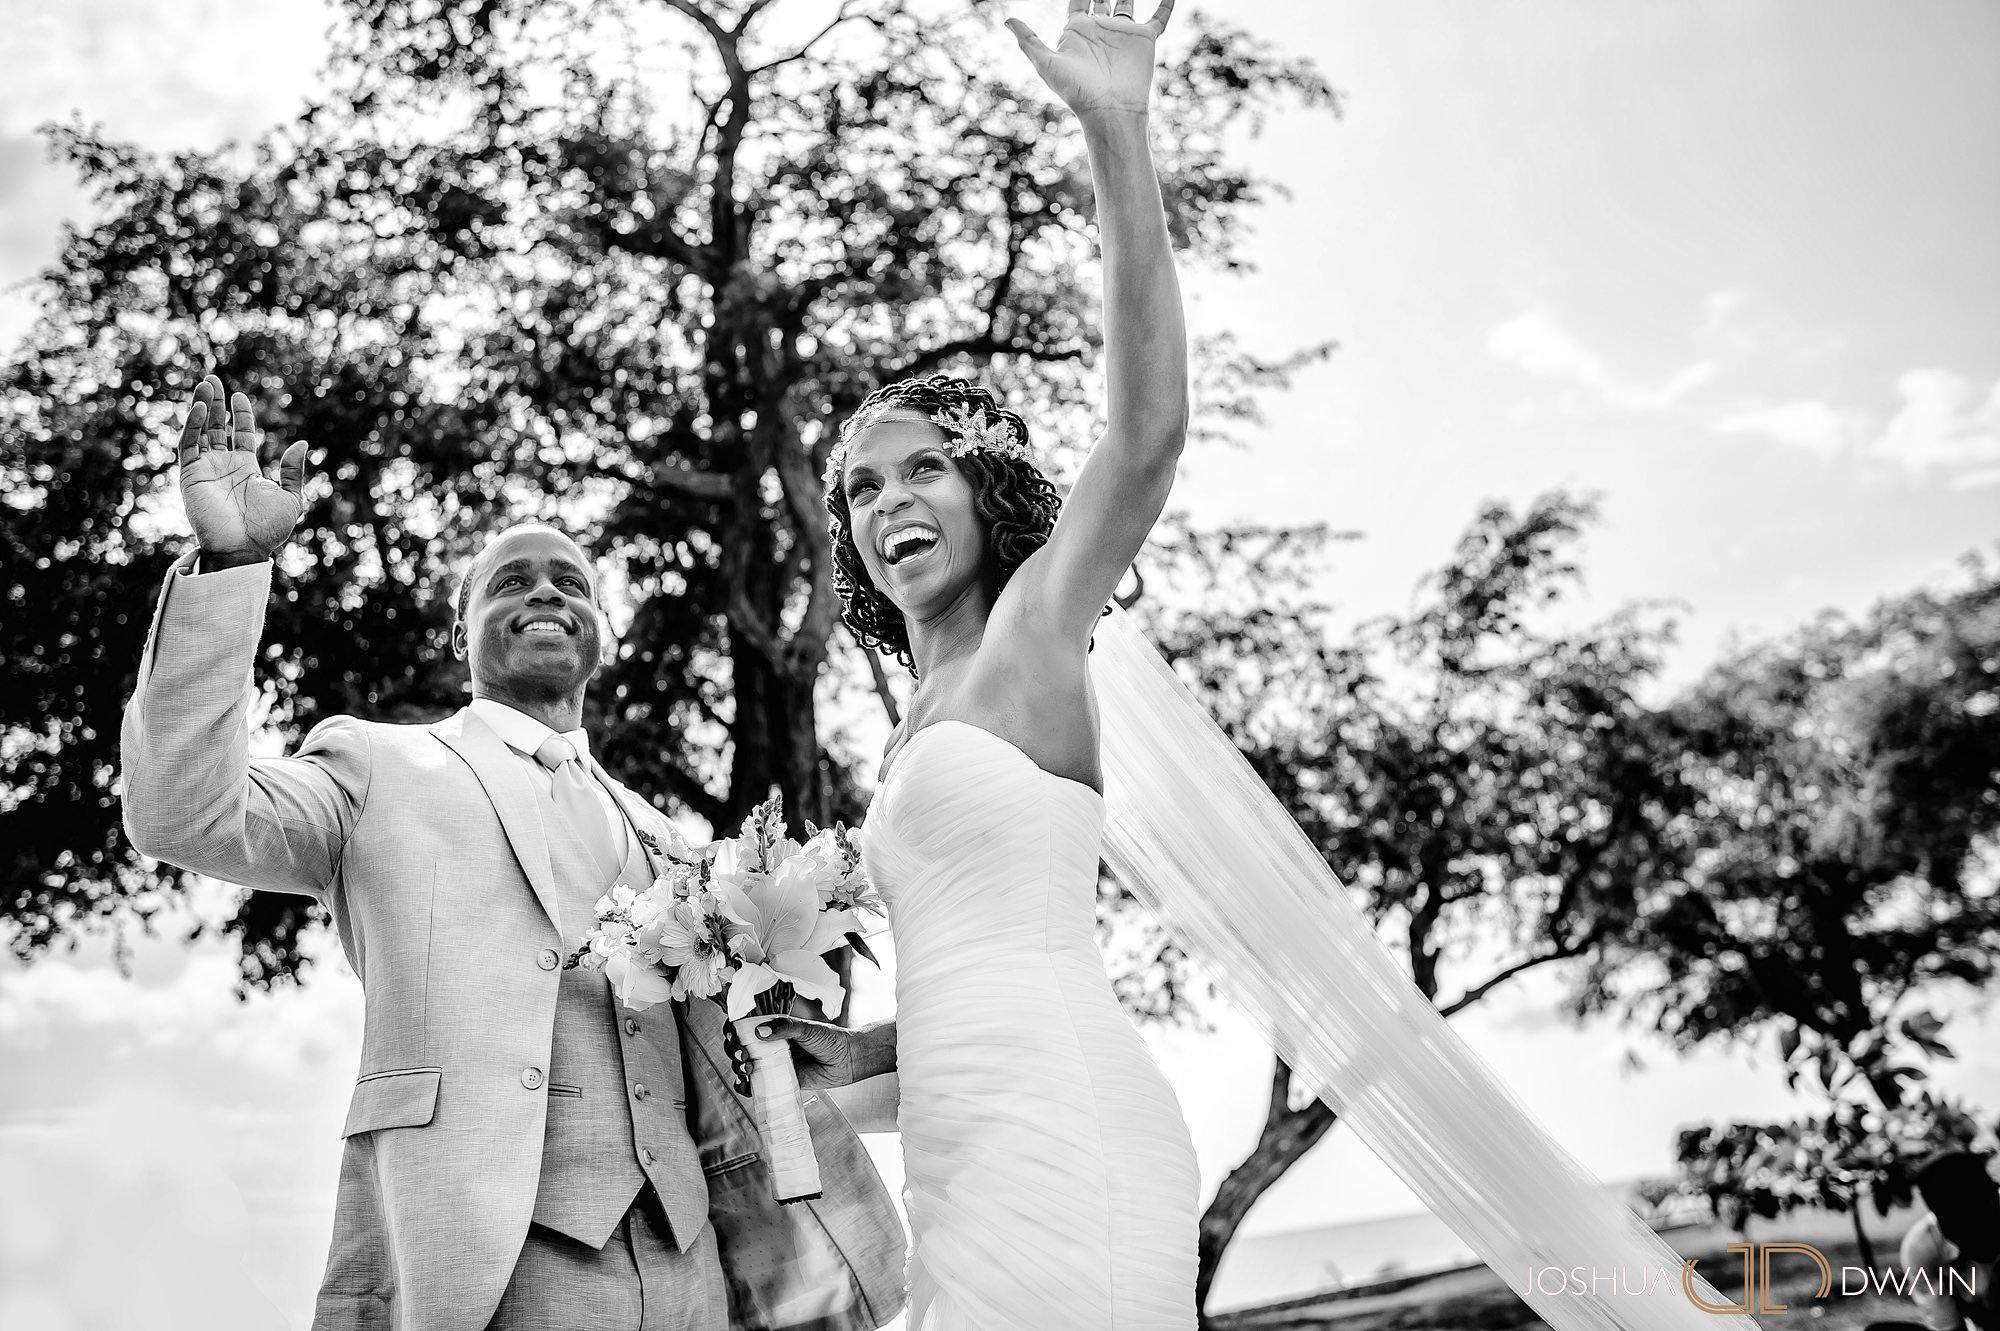 joshua-dwain-weddings-gallery-best-wedding-photographers-us-011